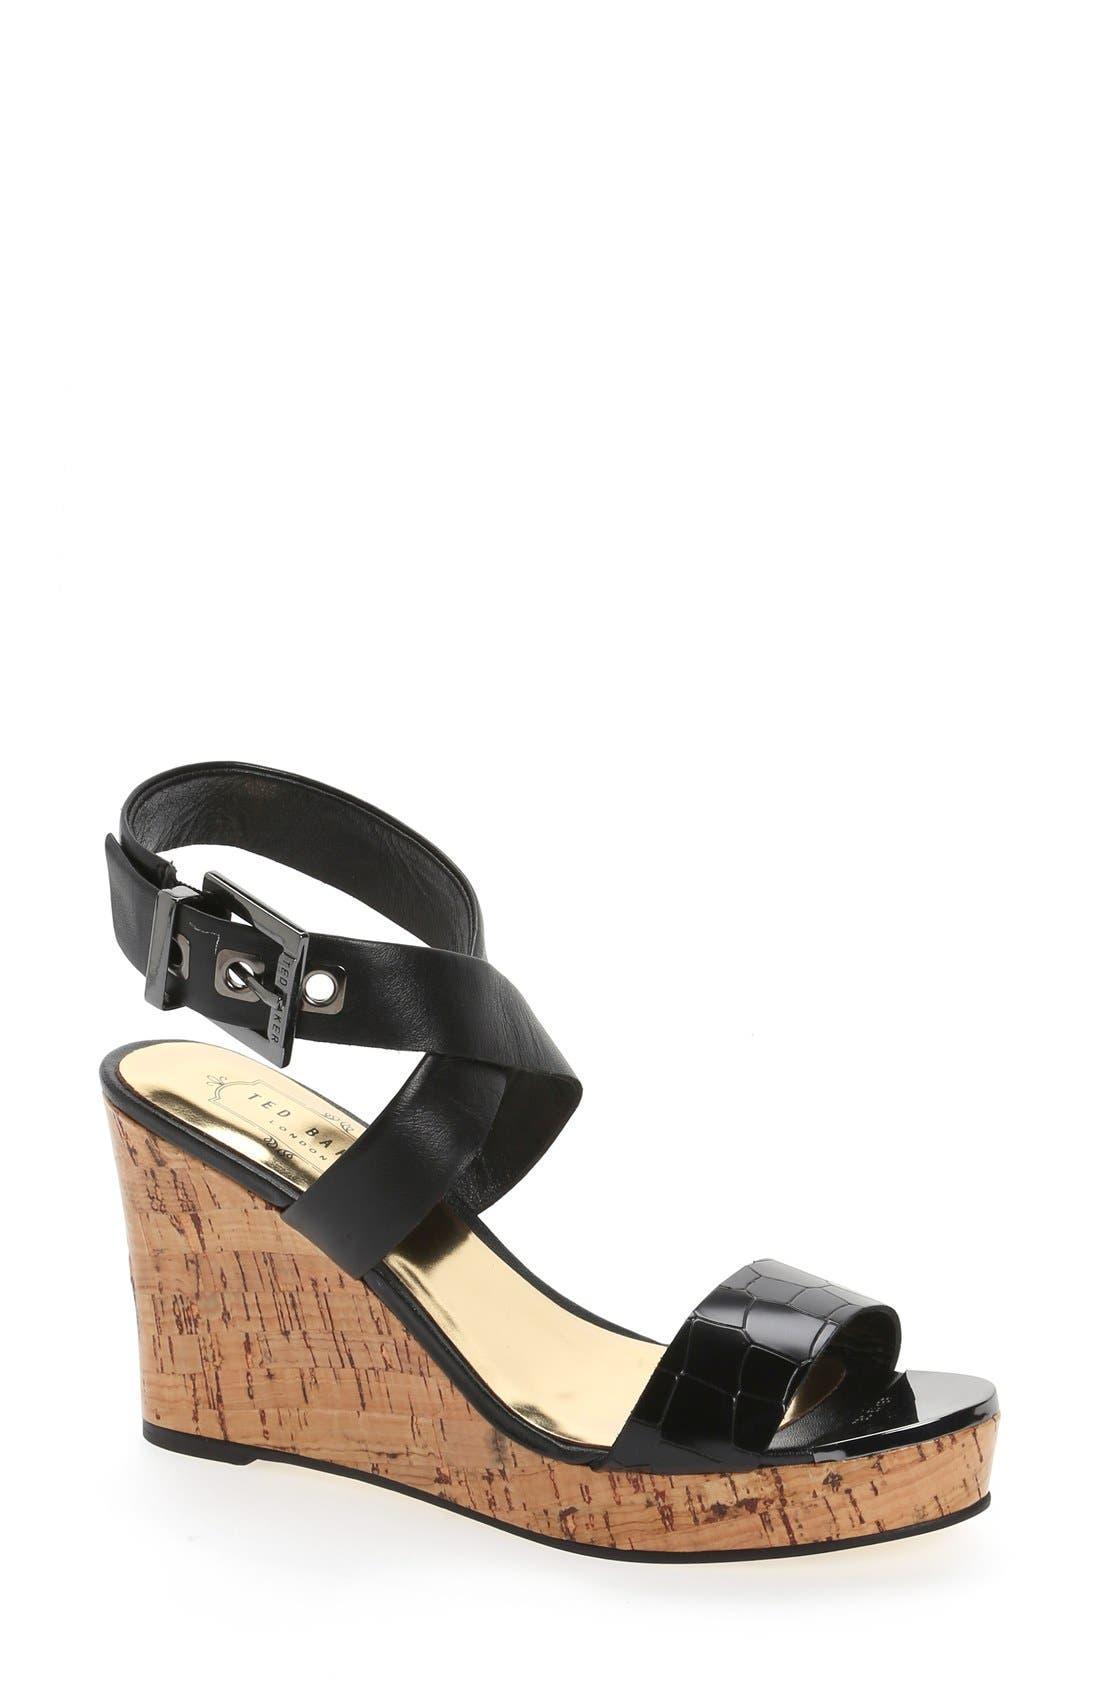 Alternate Image 1 Selected - Ted Baker London 'Oliviaa' Wedge Sandal